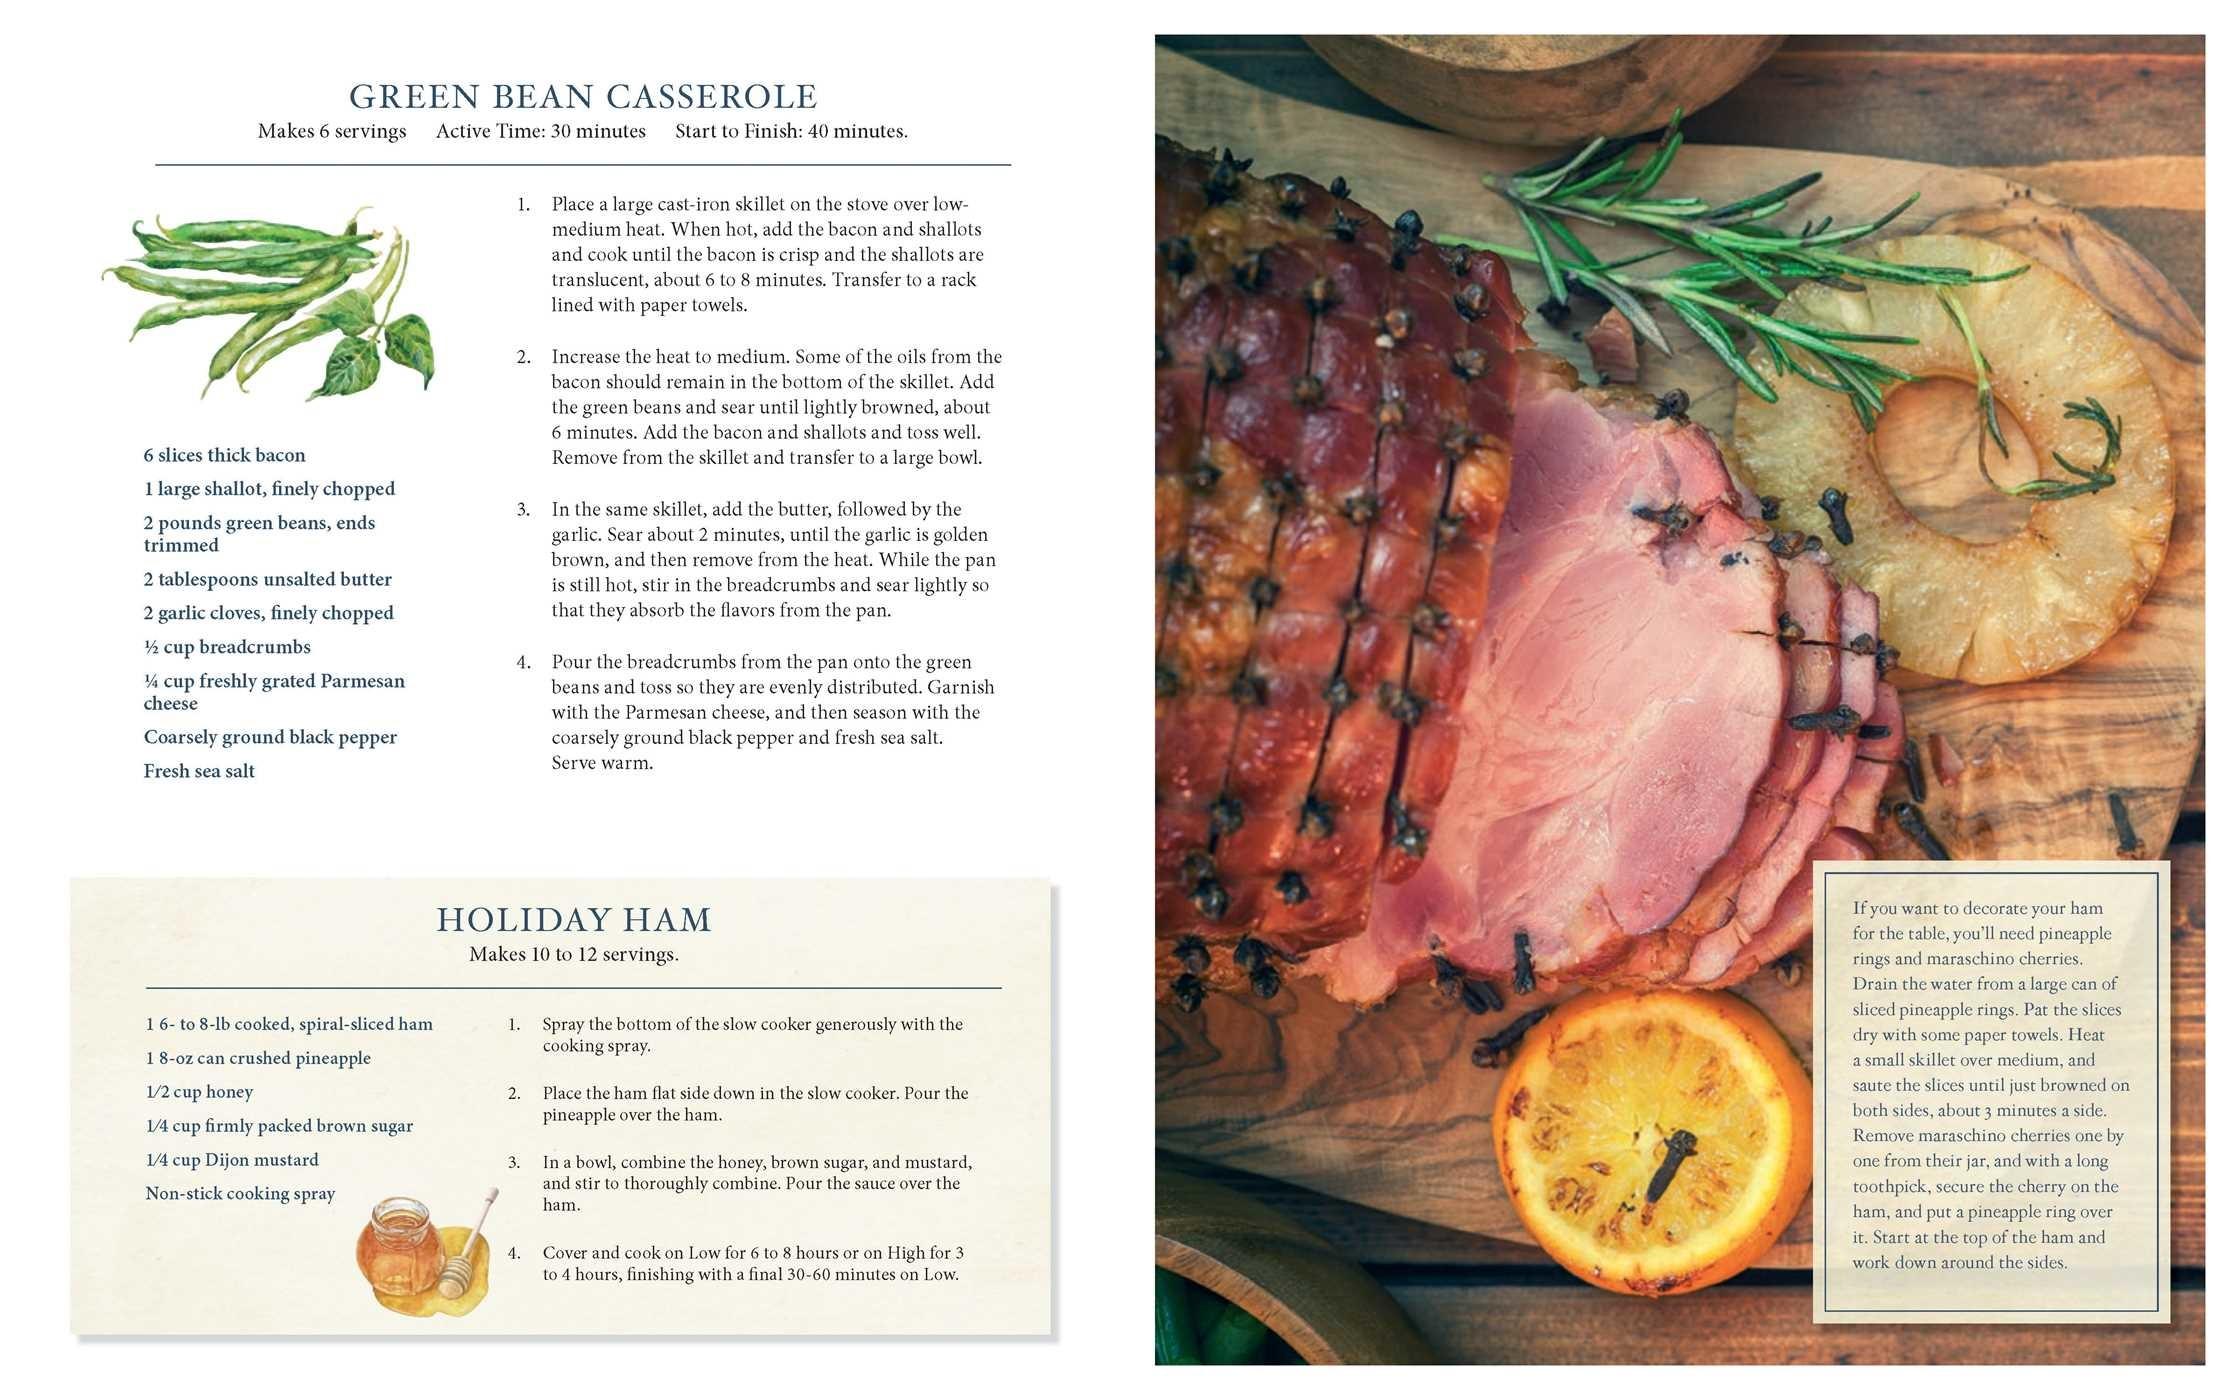 The sunday dinner cookbook 9781604337525.in06